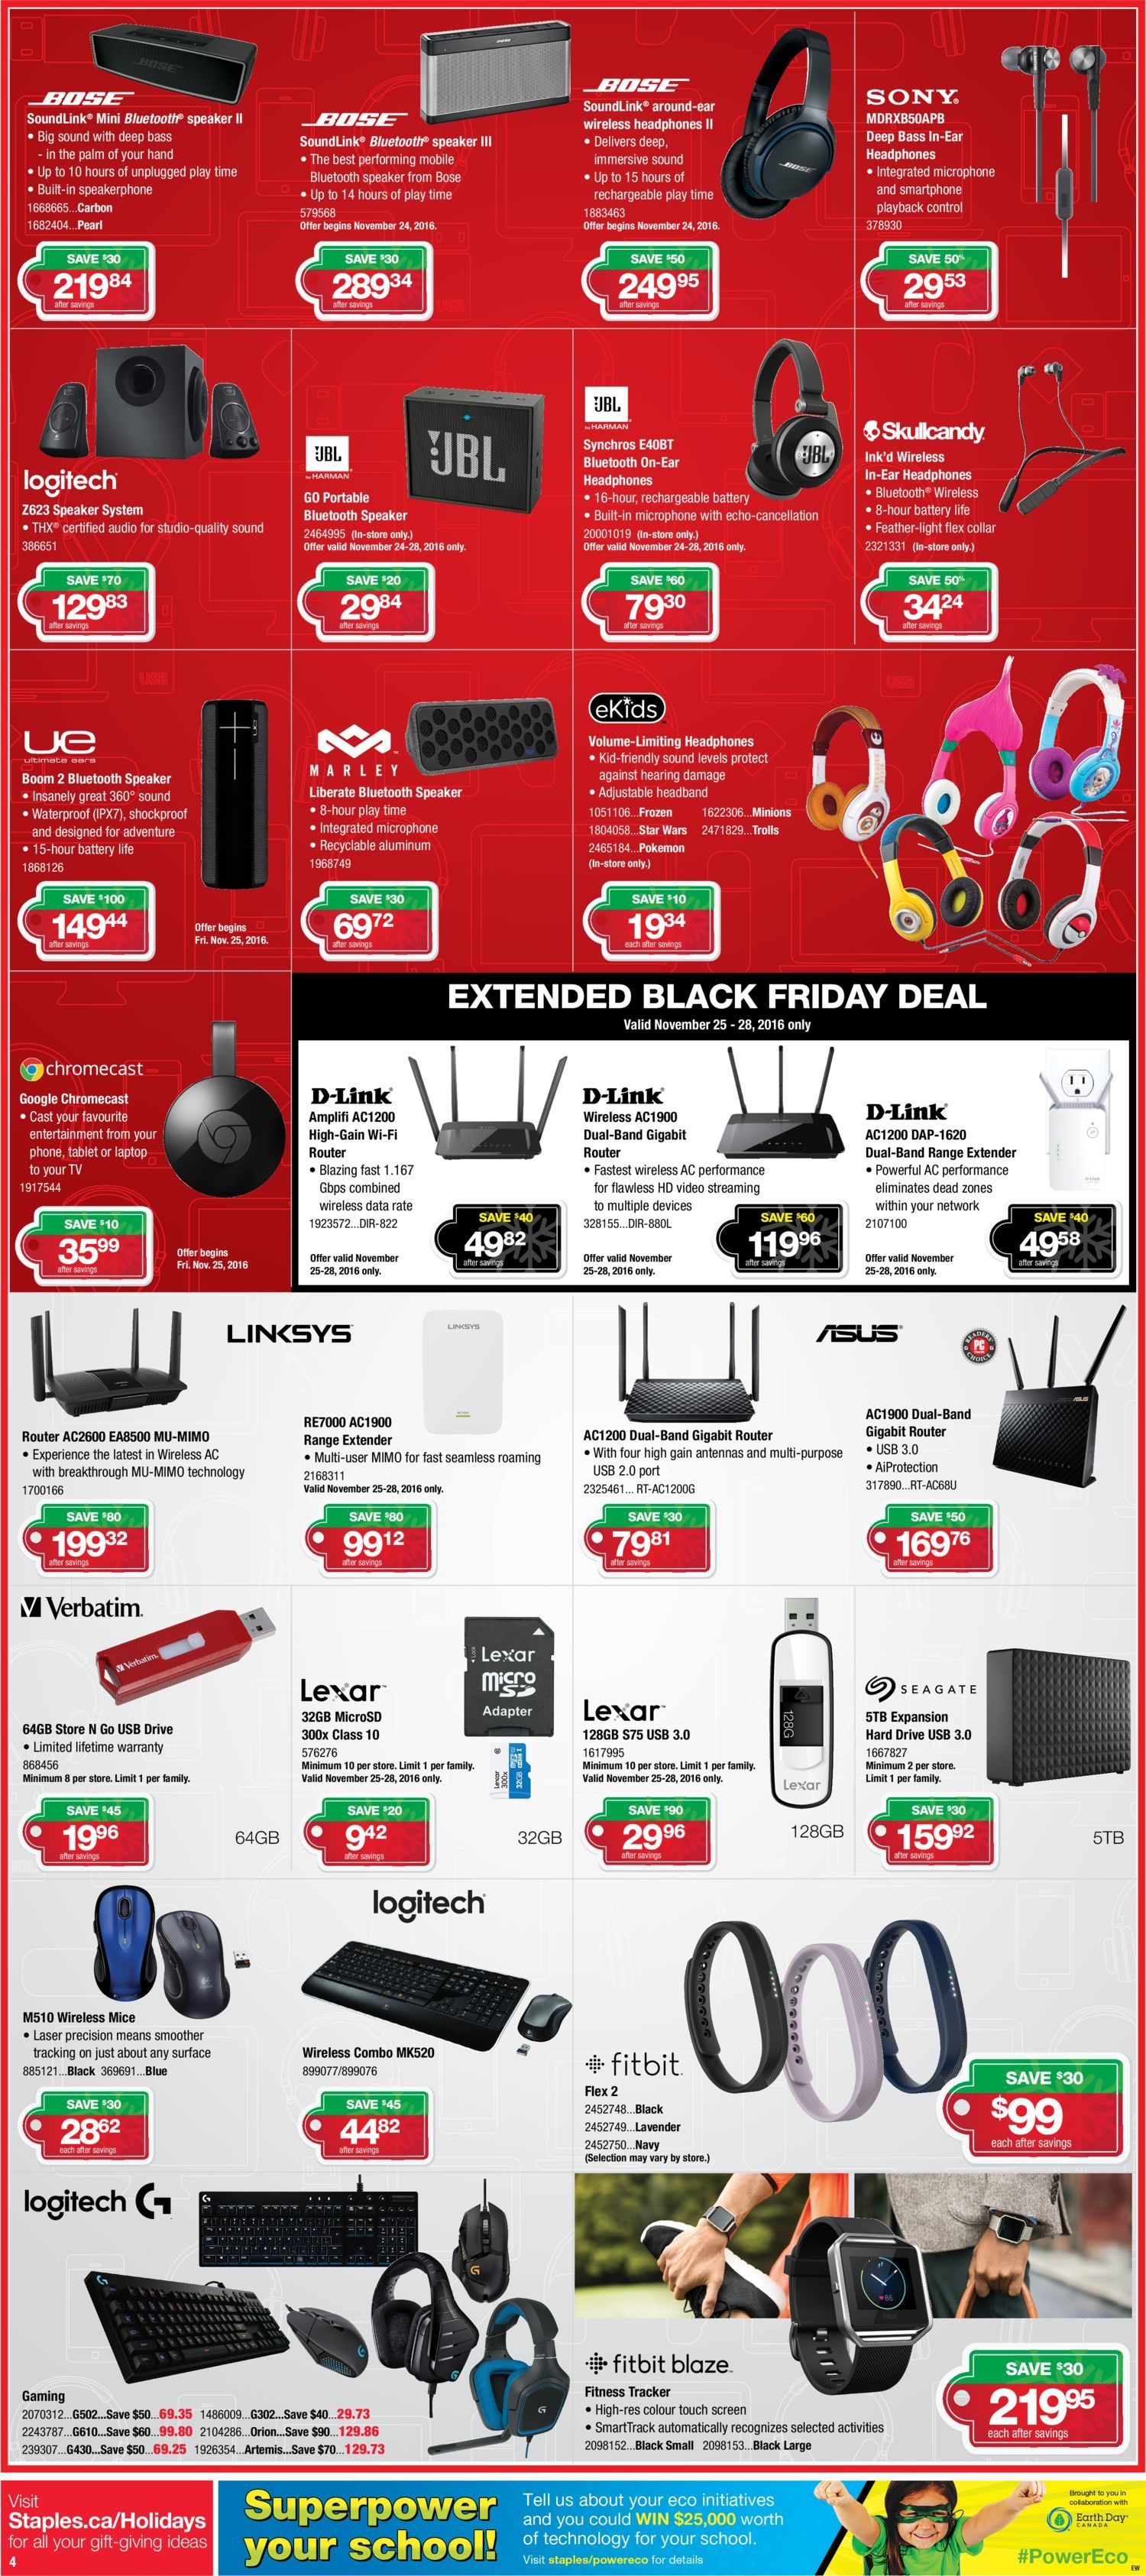 89c7ac9f21f8 Staples Weekly Flyer - Make More Happen - Black Friday Sale - Nov 23 – 29 -  RedFlagDeals.com